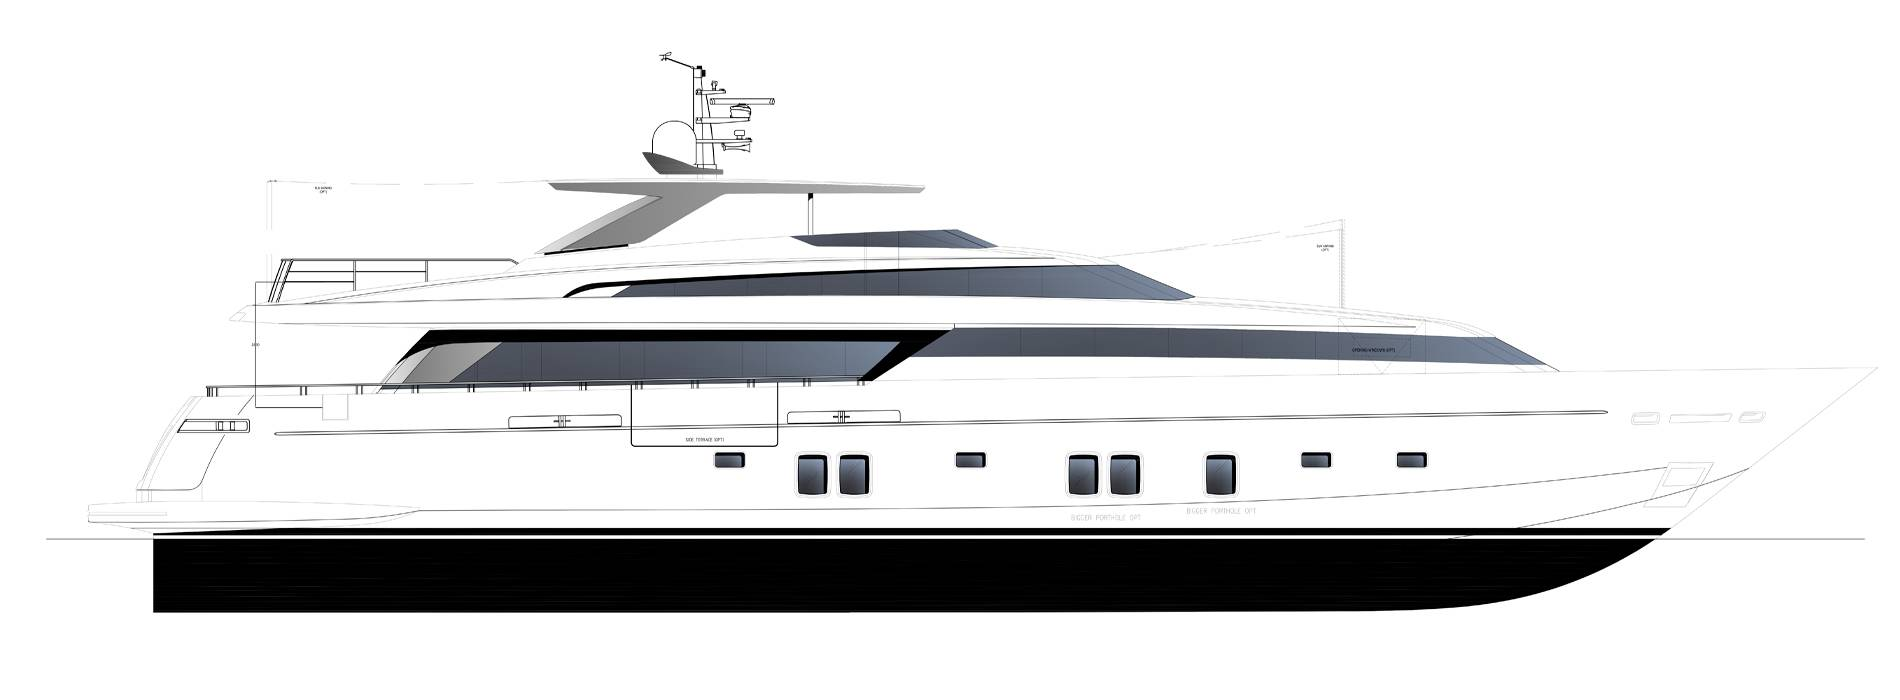 Sanlorenzo Yachts SL118-628  外观